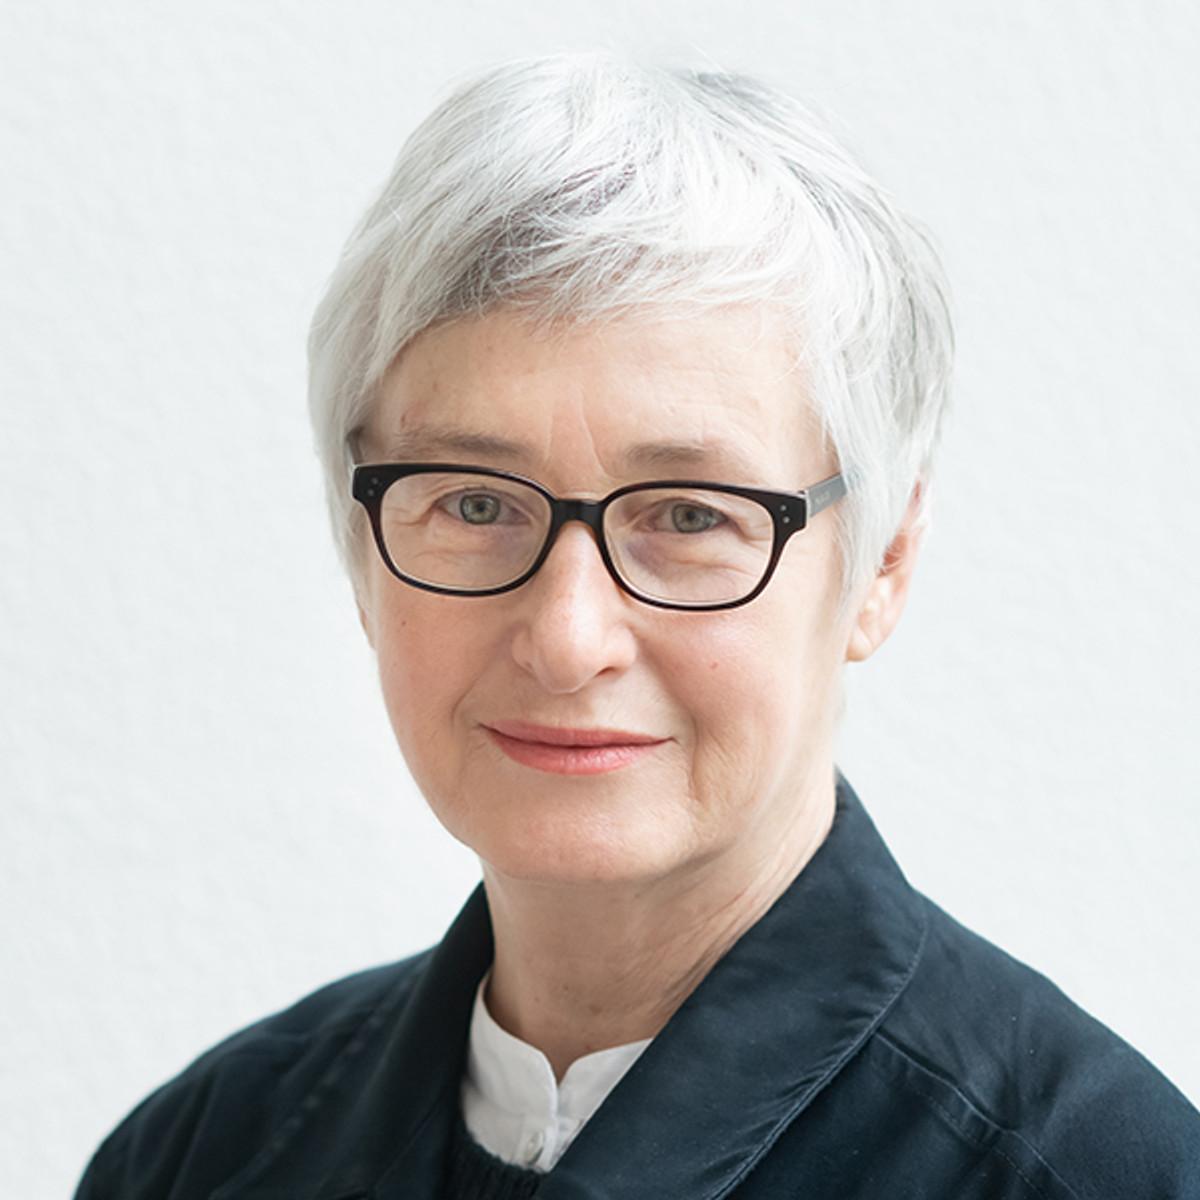 Christina Barton